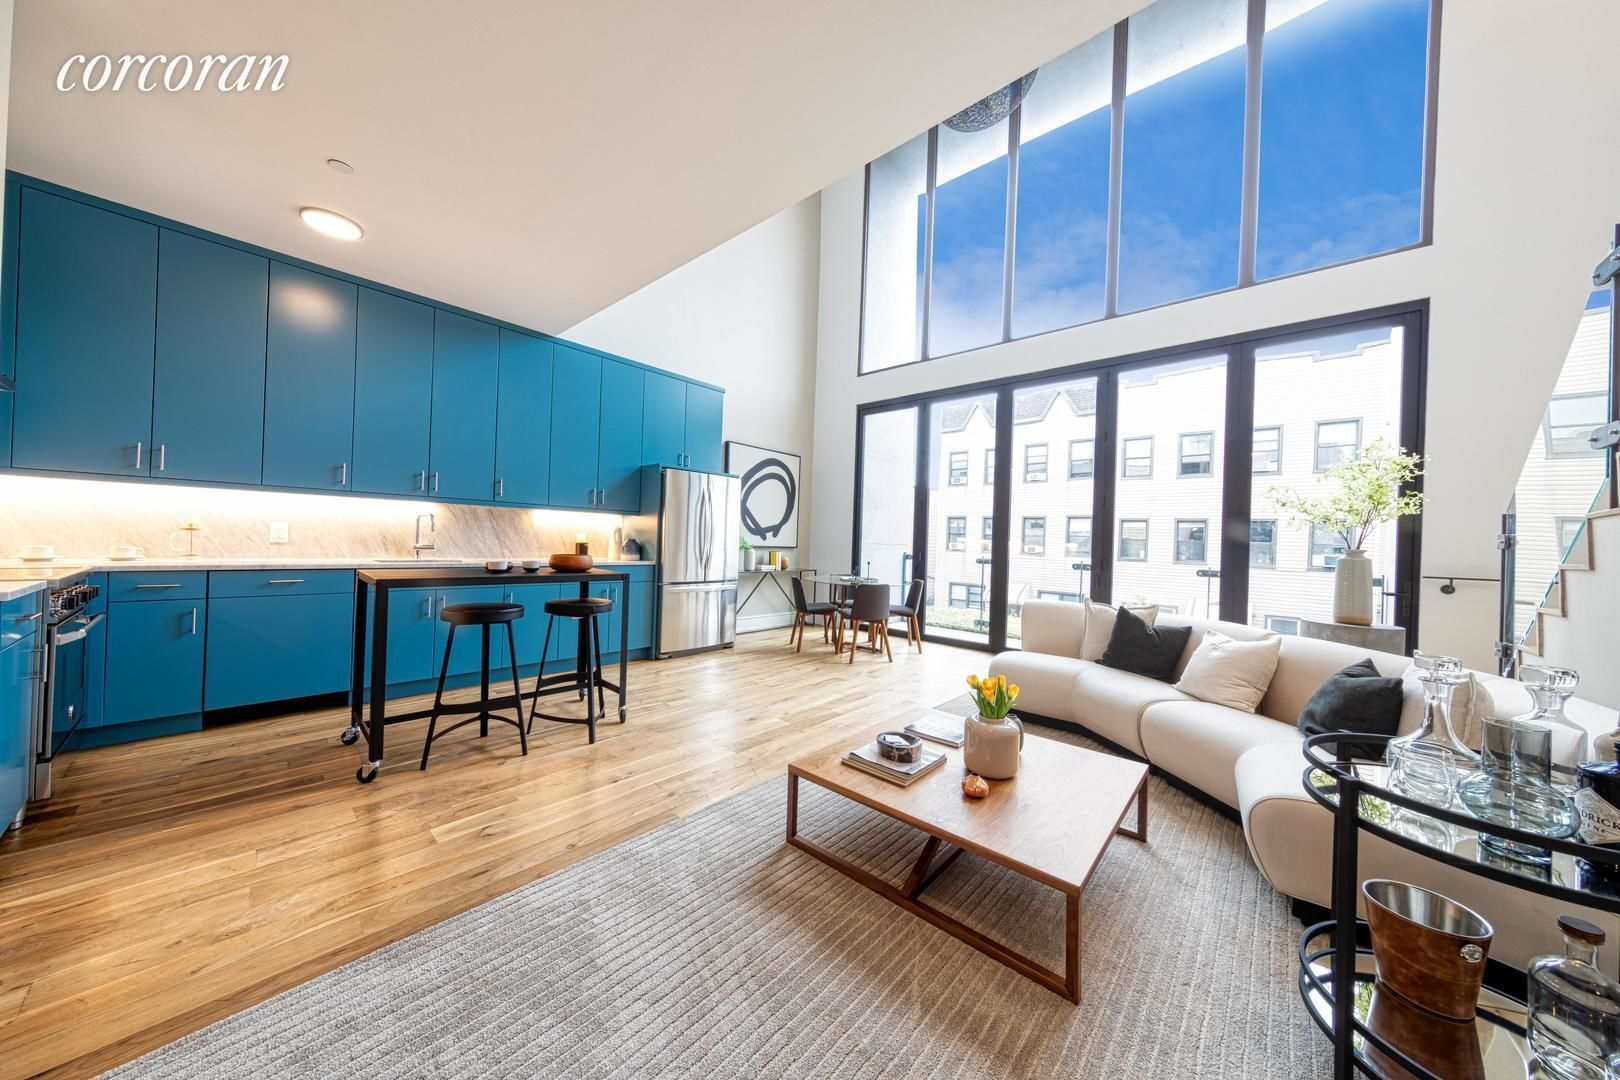 Apartment for sale at 237 Devoe Street, Apt 2F